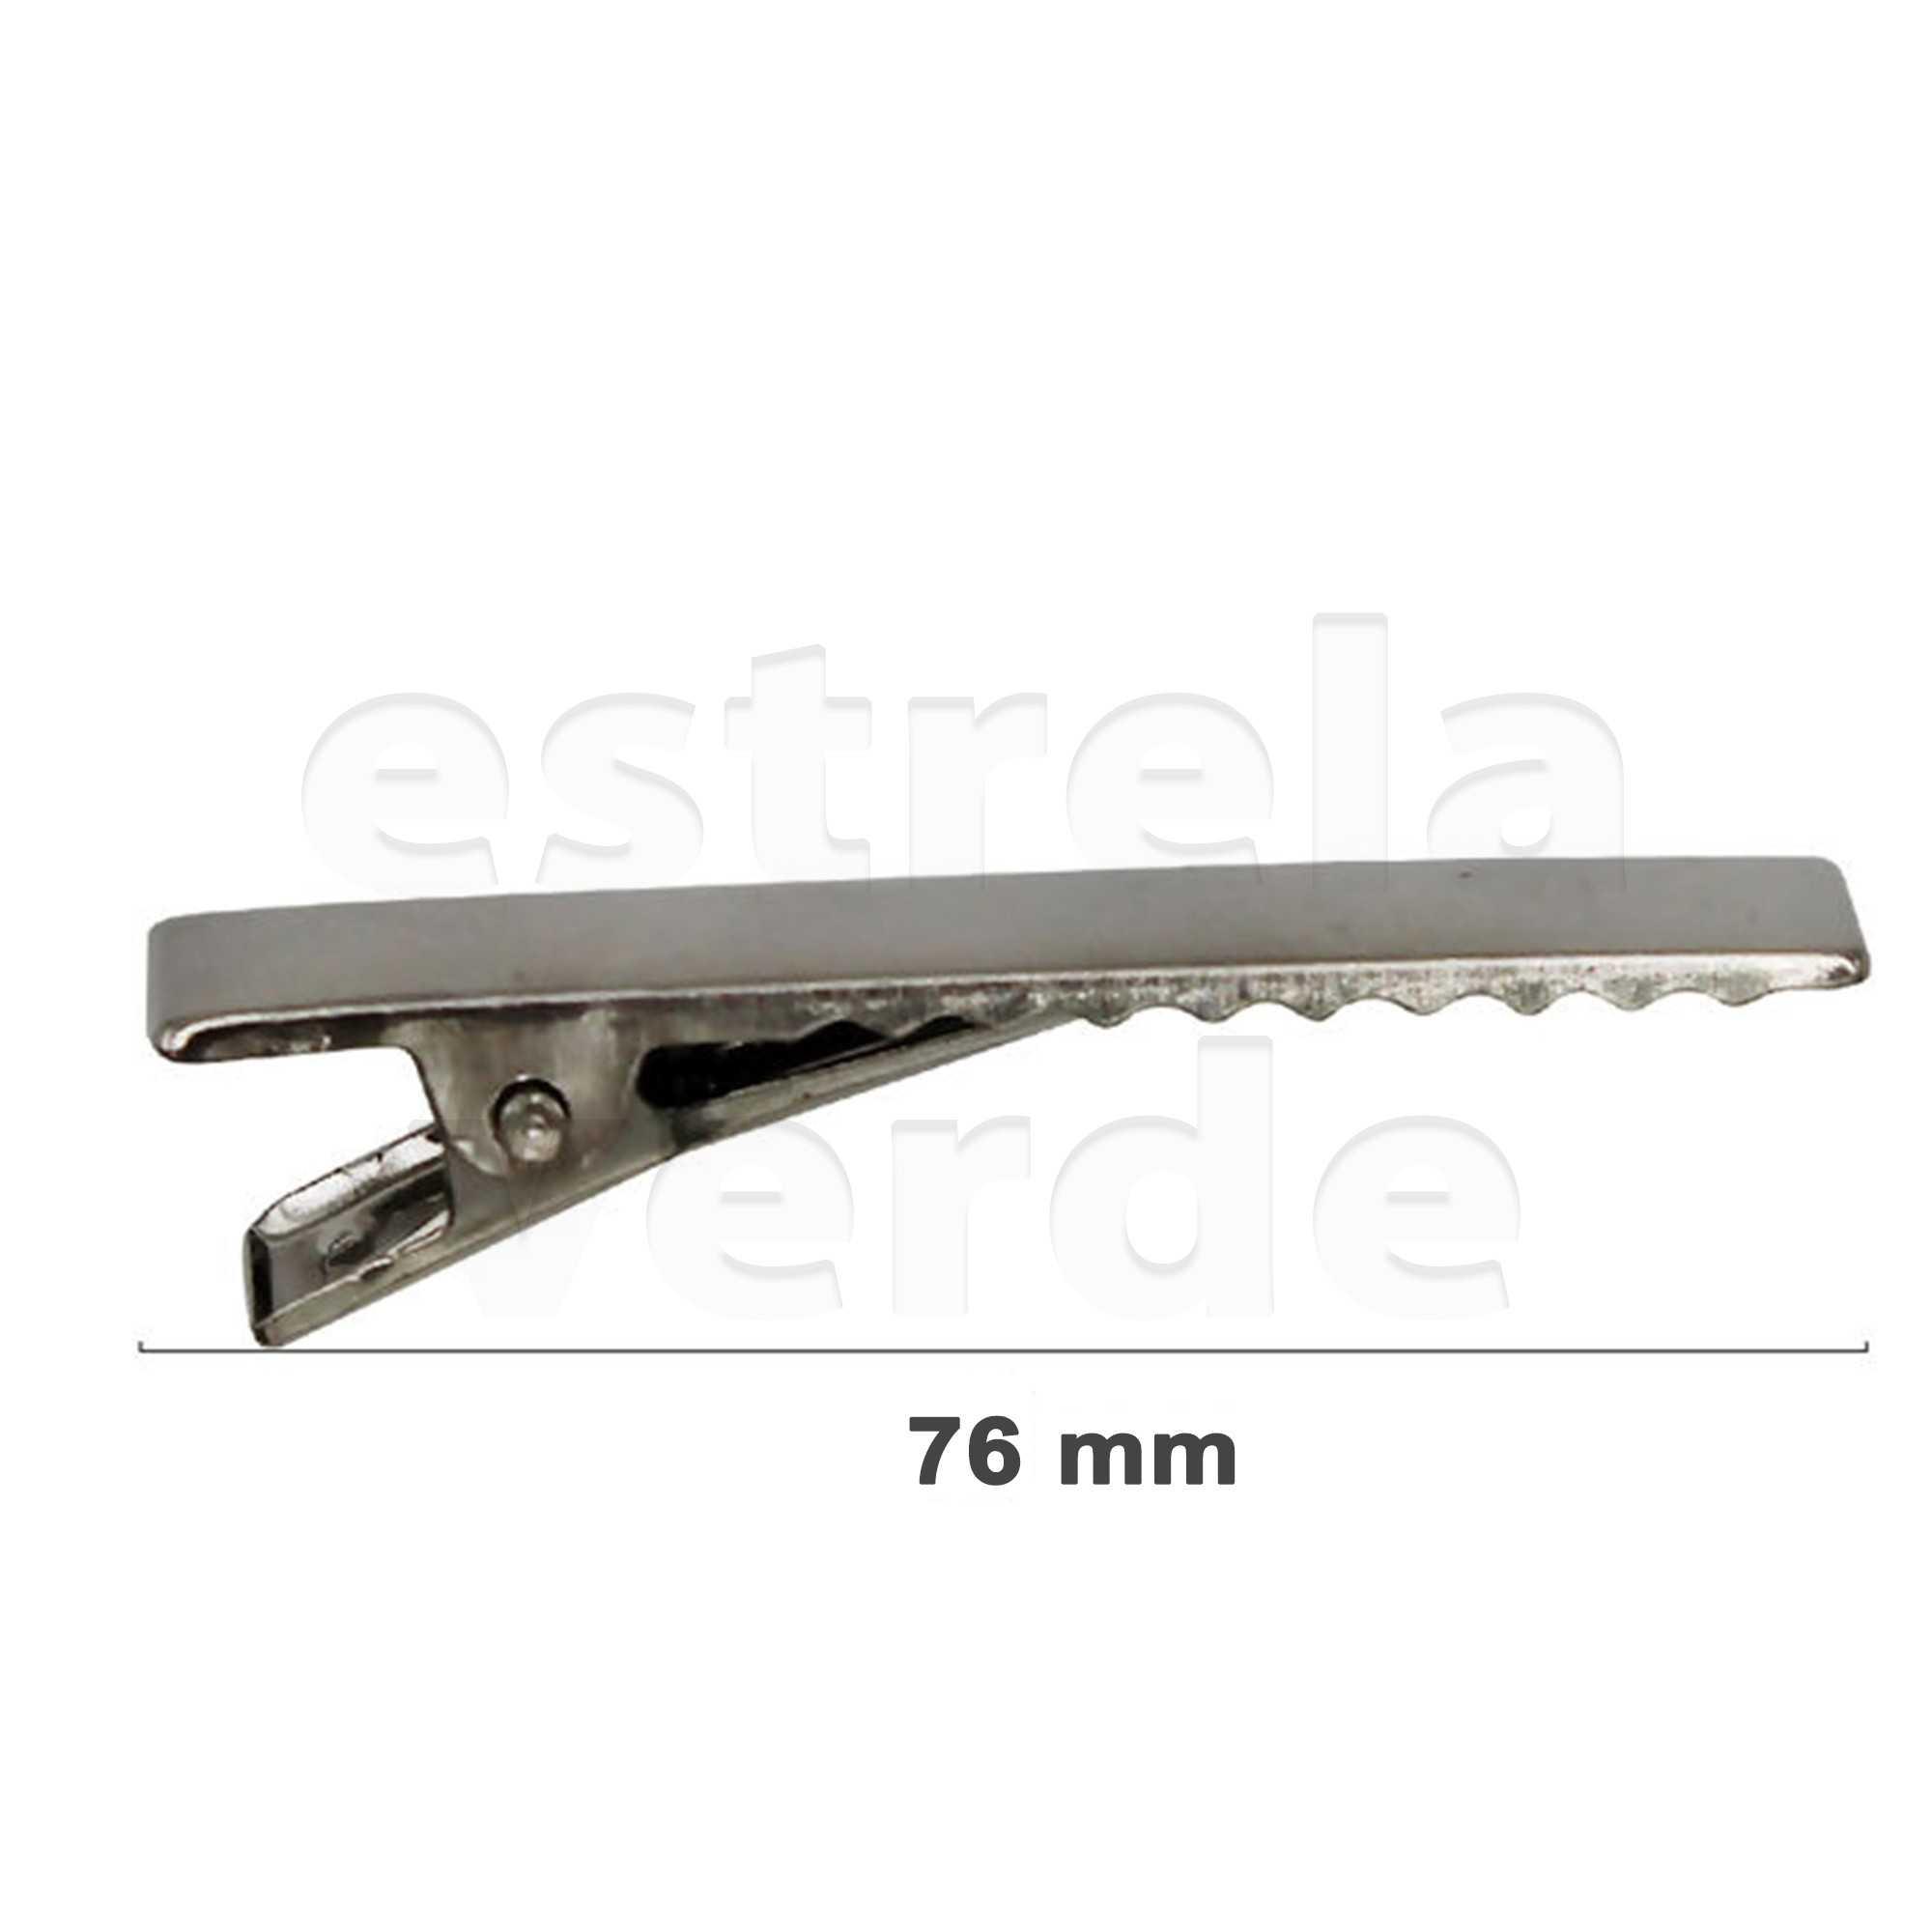 PRESILHA JACARE 76MM RO115116 C/100UN NIQUEL  - Estrela Verde